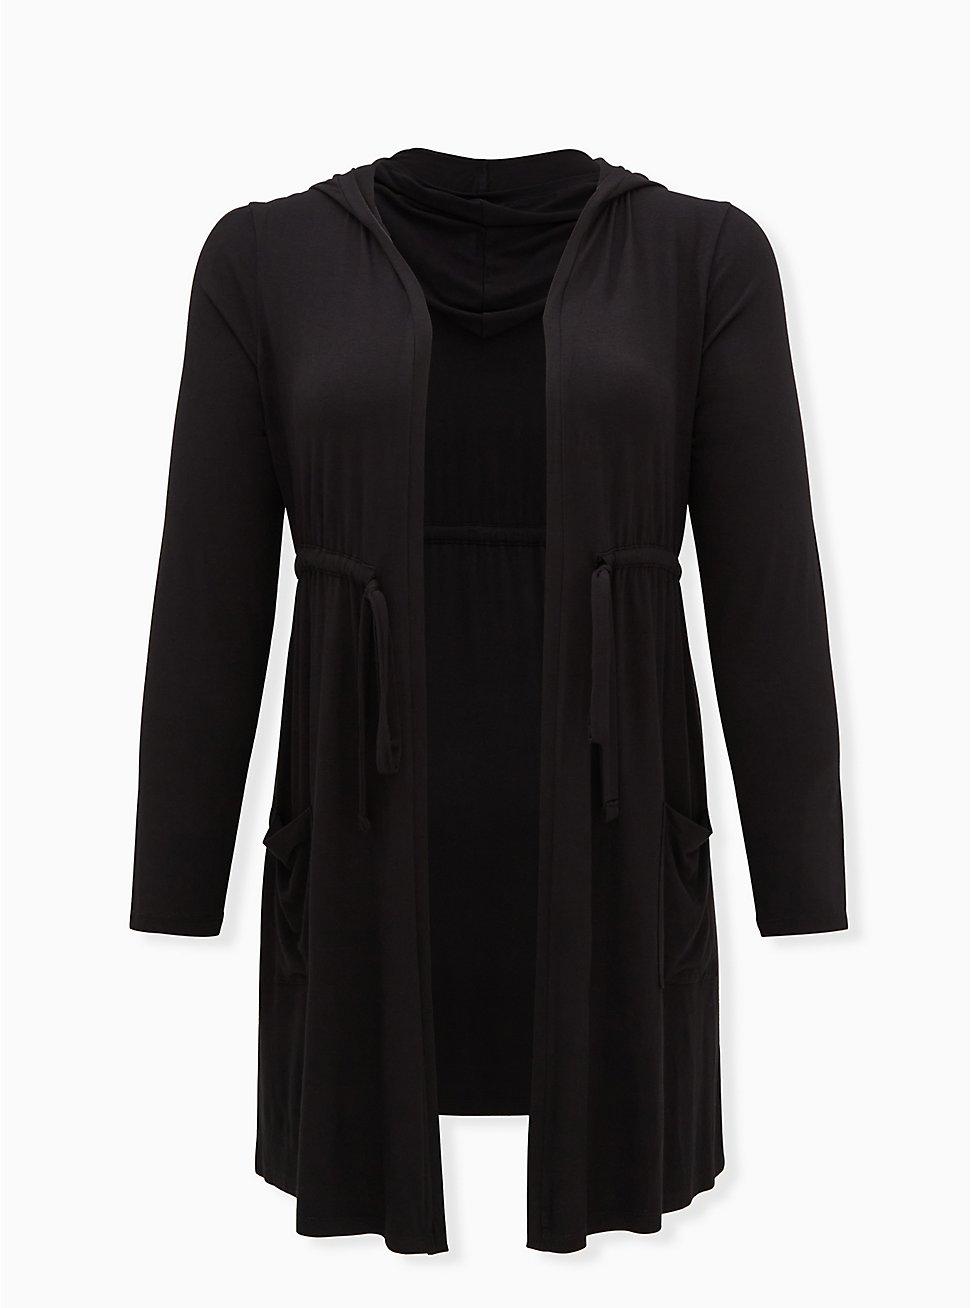 Super Soft Black Drawstring Hooded Anorak, DEEP BLACK, hi-res